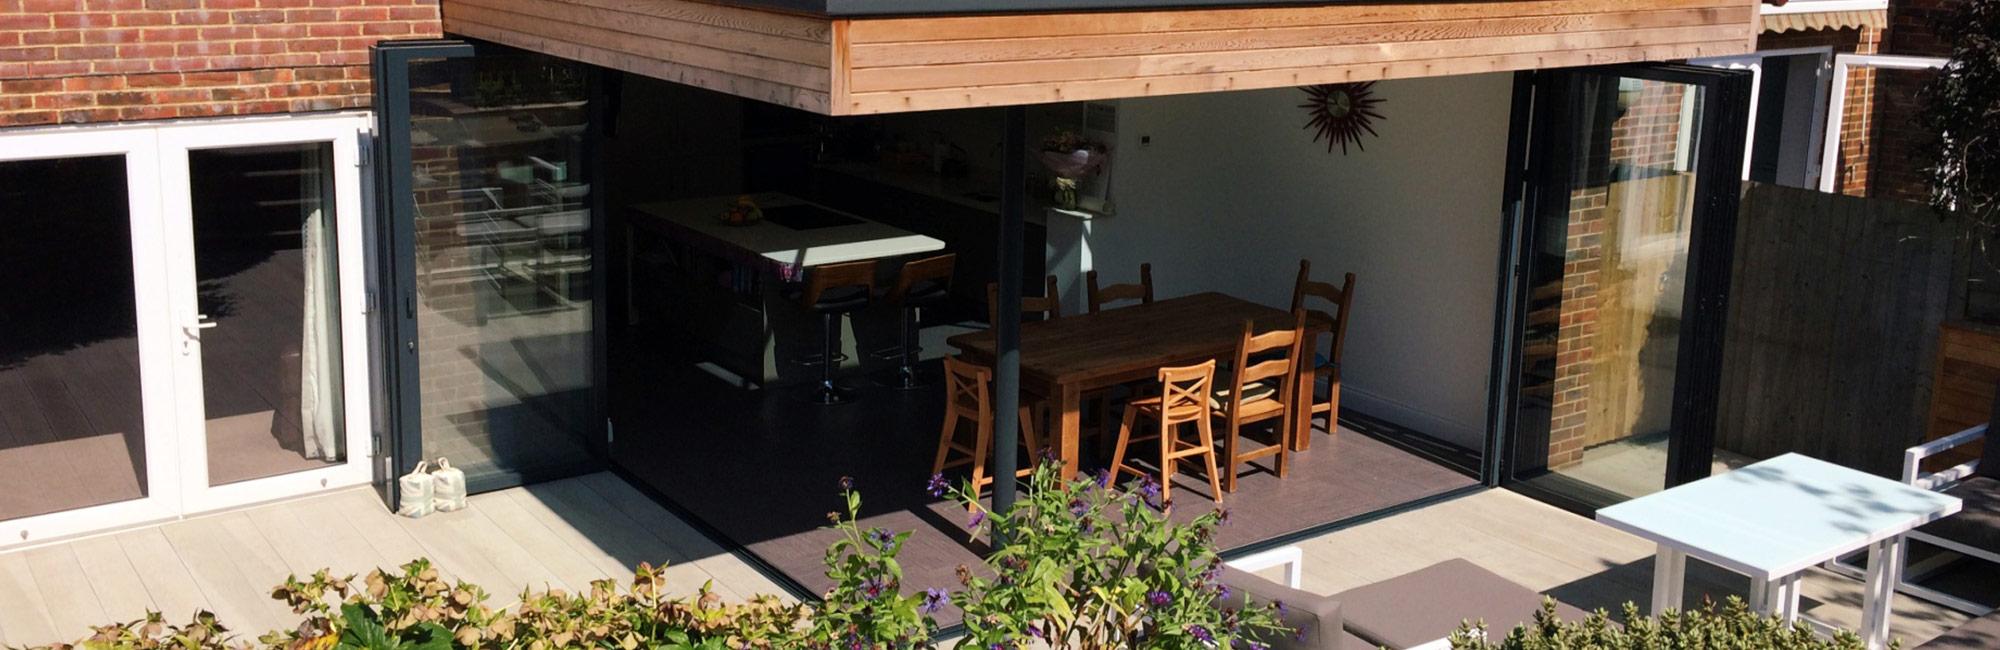 Sunflex SF55 \u0026 SF75 & Aluminium - Sunflex SF55 \u0026 SF75 Bifold Door - Park Farm Design